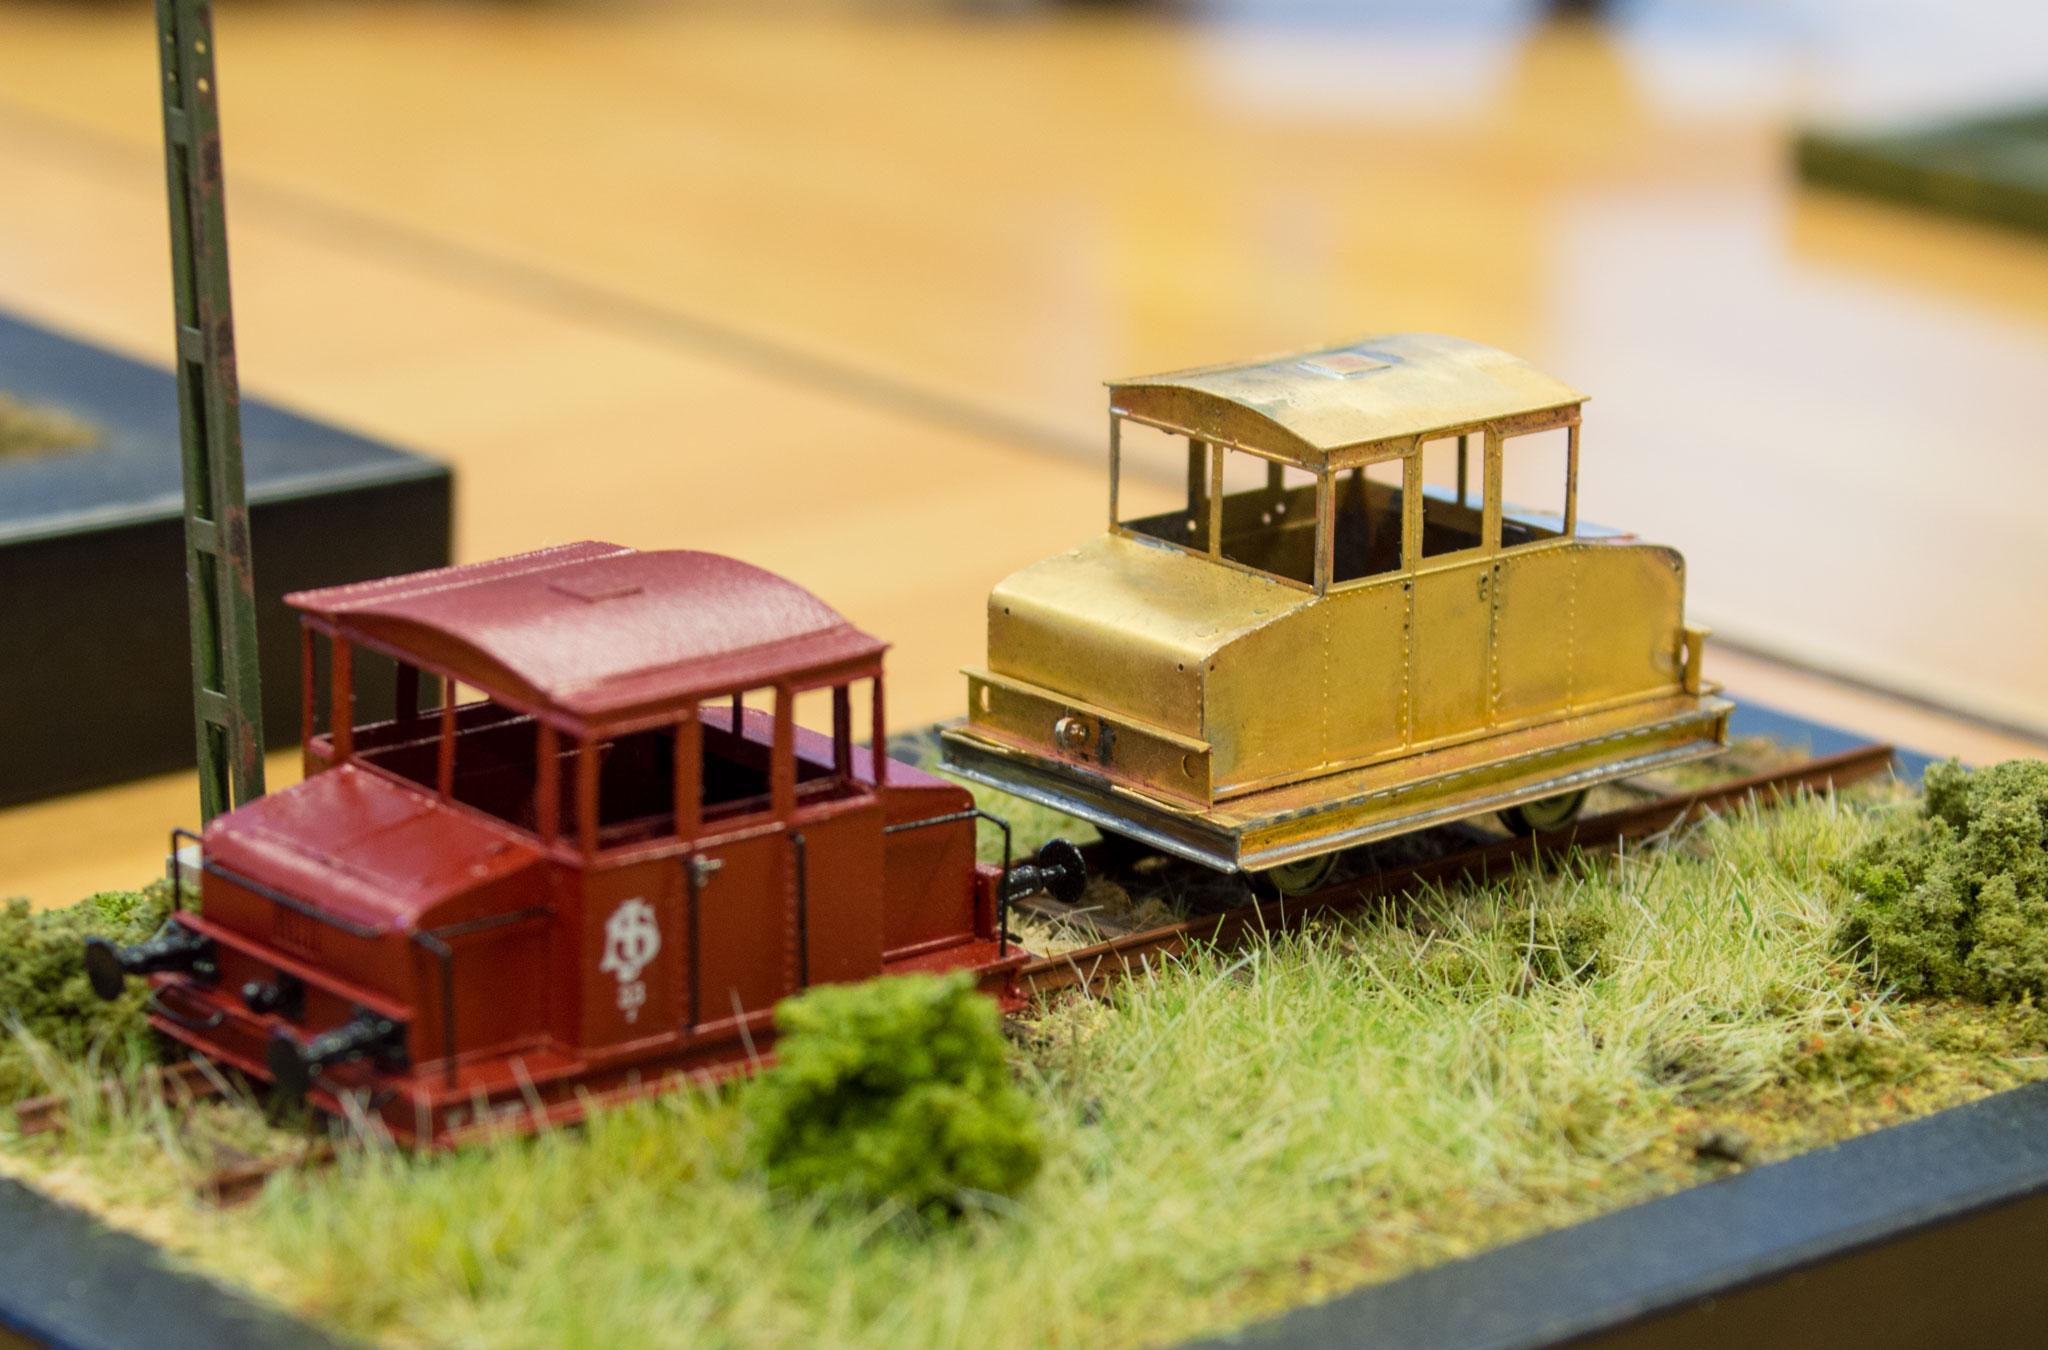 Diorama med håndbygget rangertraktor og rangertraktoroverdel i SJ-bemaling